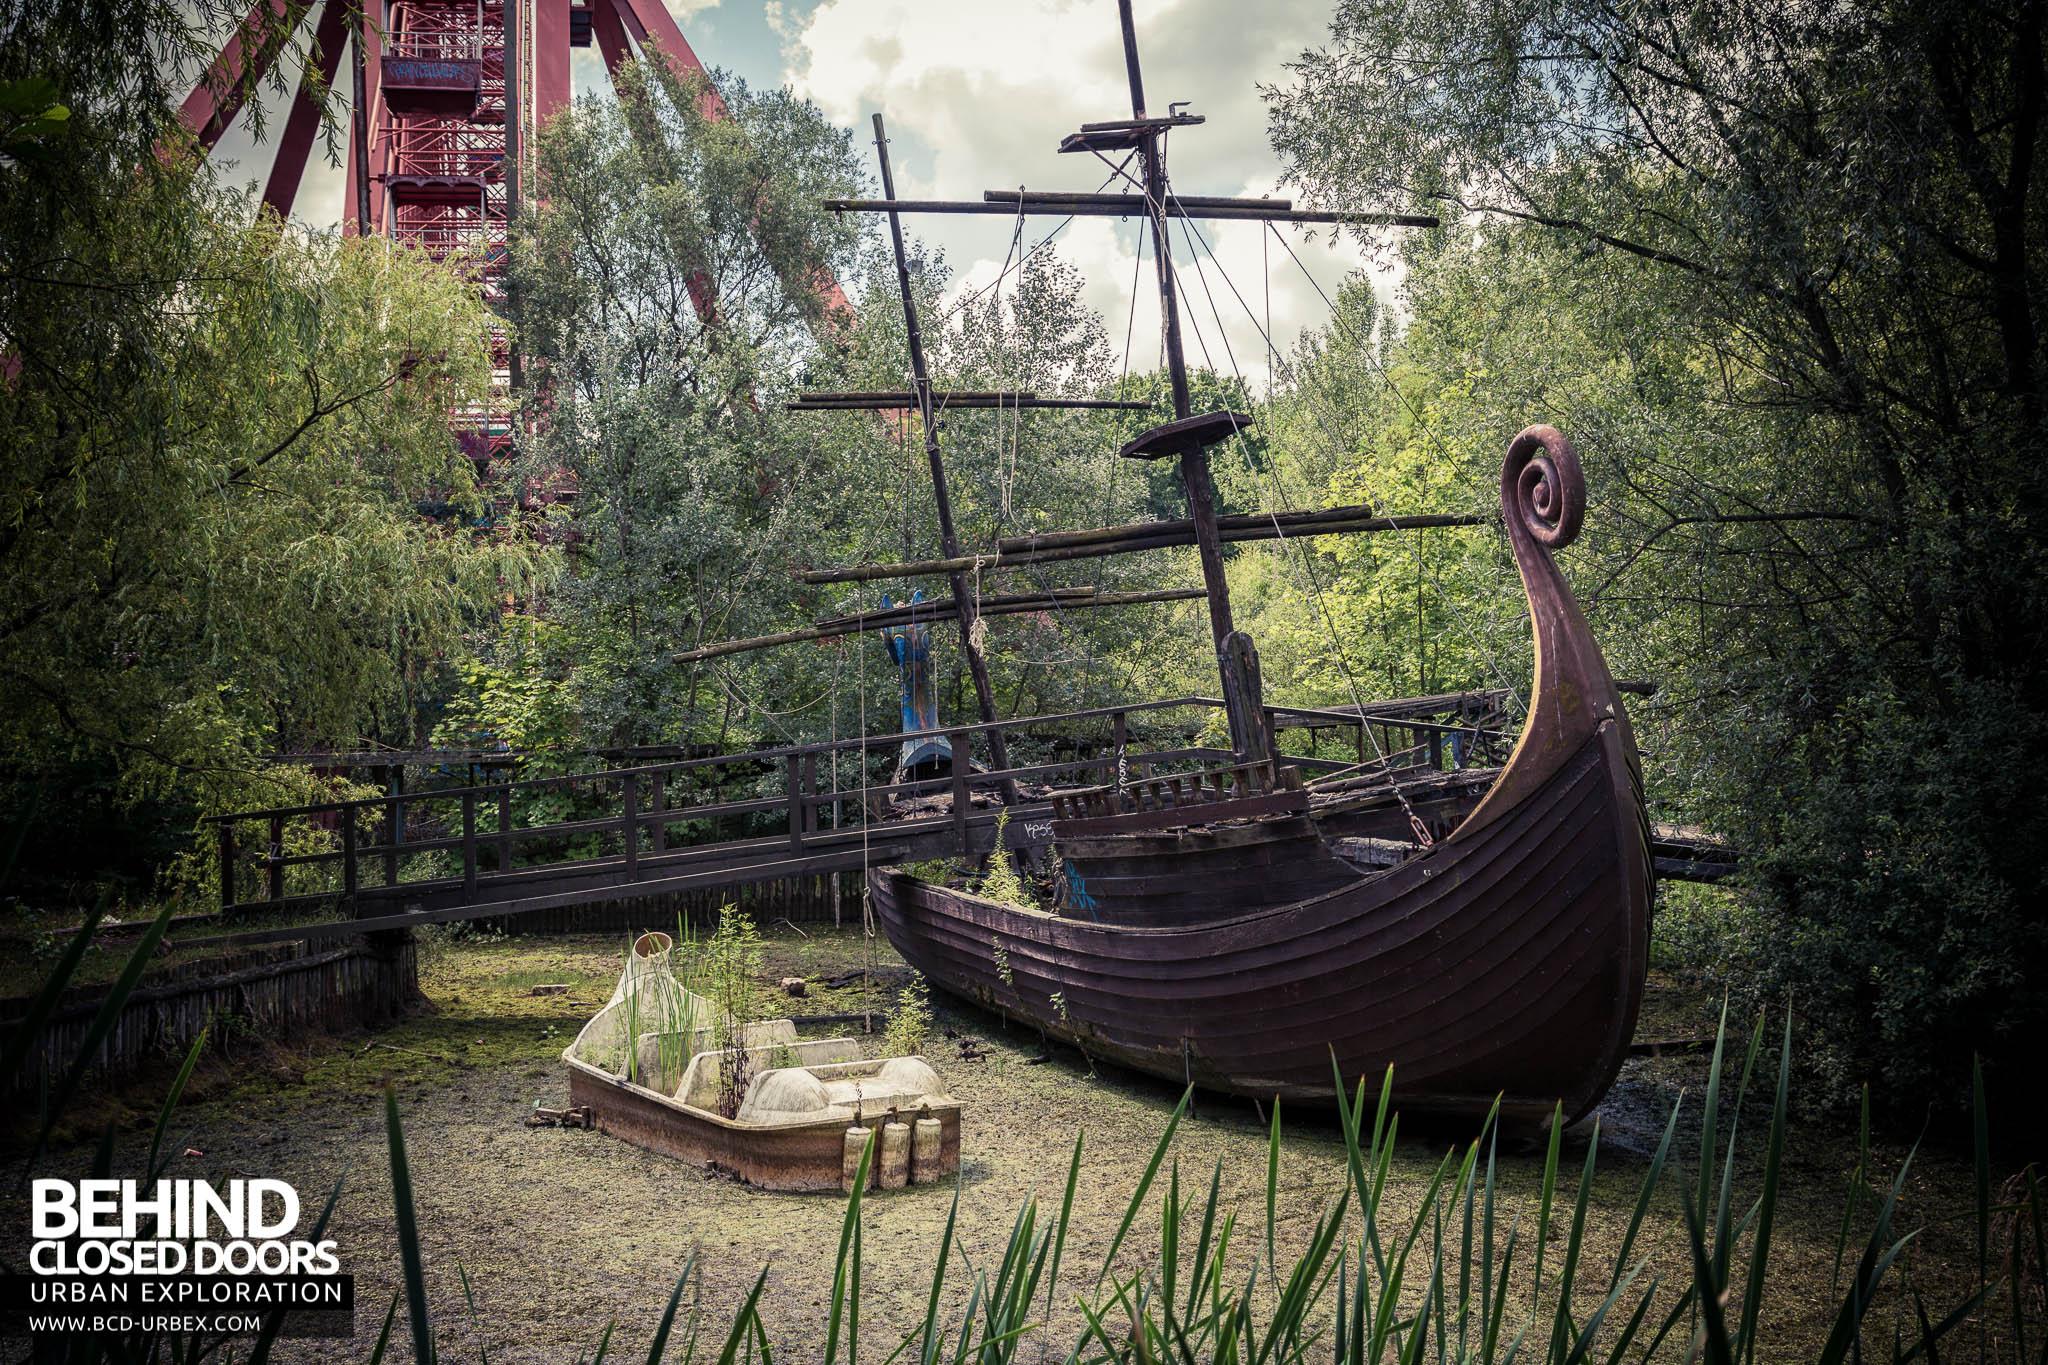 Abandoned Amusement Park Spreepark Berlin Germany 187 Urbex Behind Closed Doors